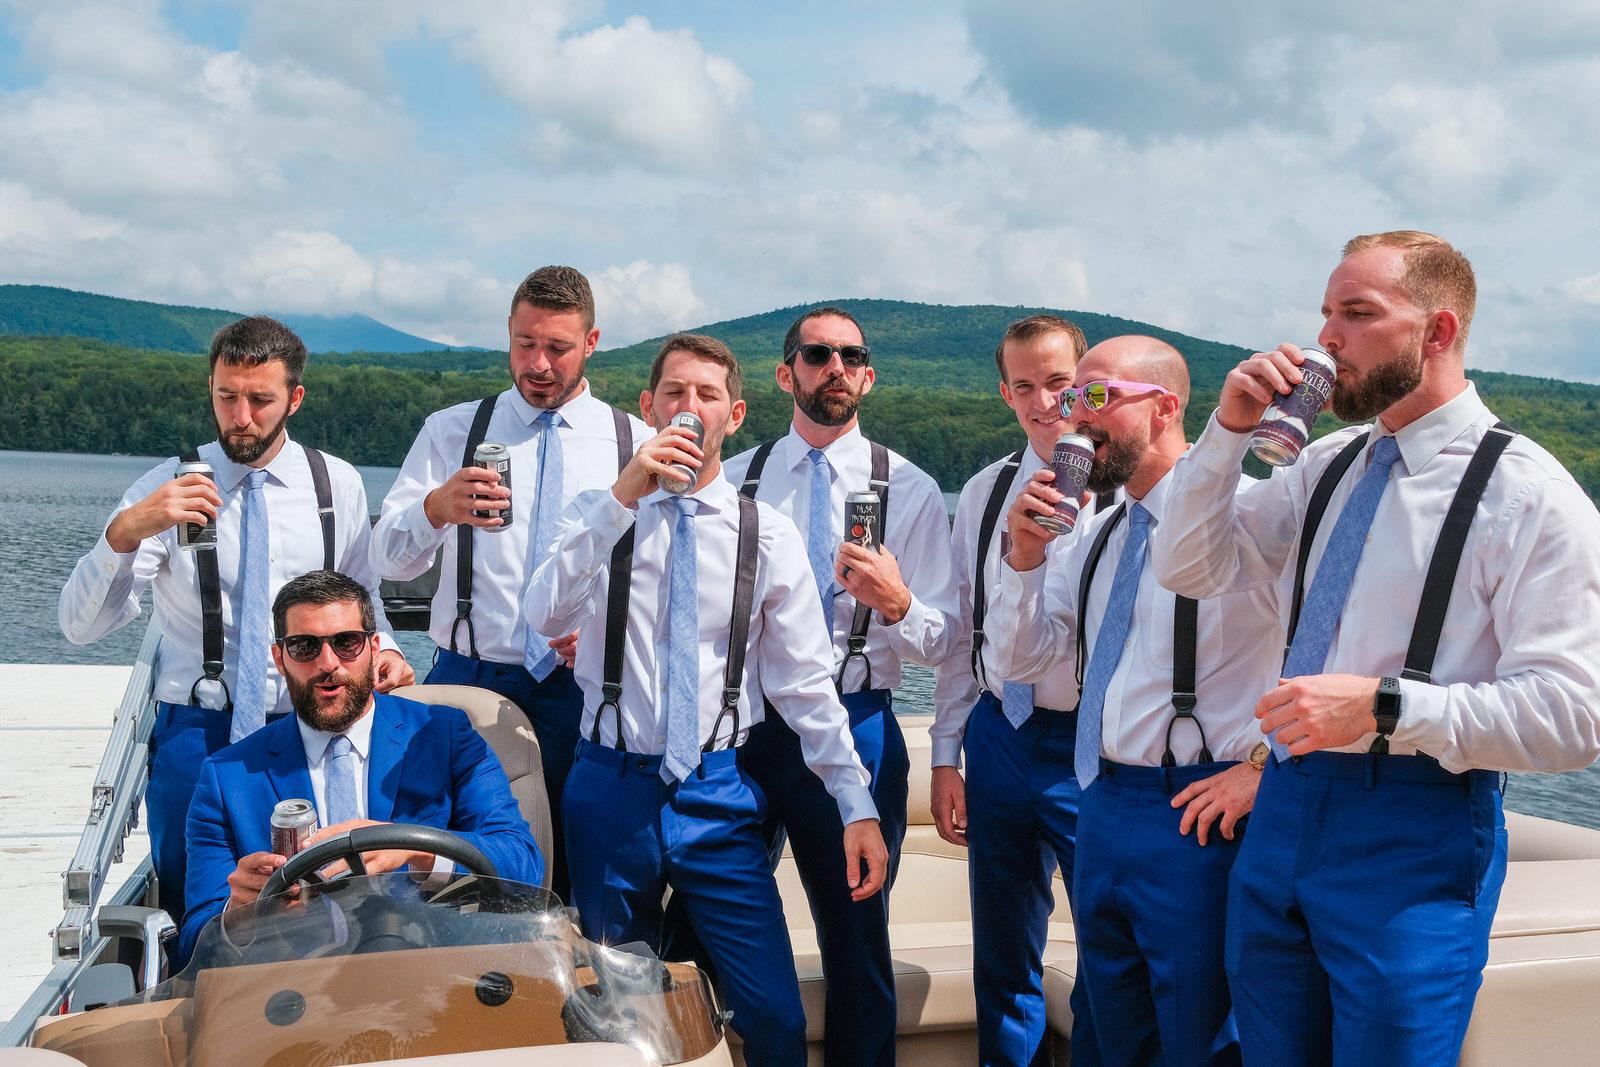 white-mountains-campground-wedding-photography-469.jpg